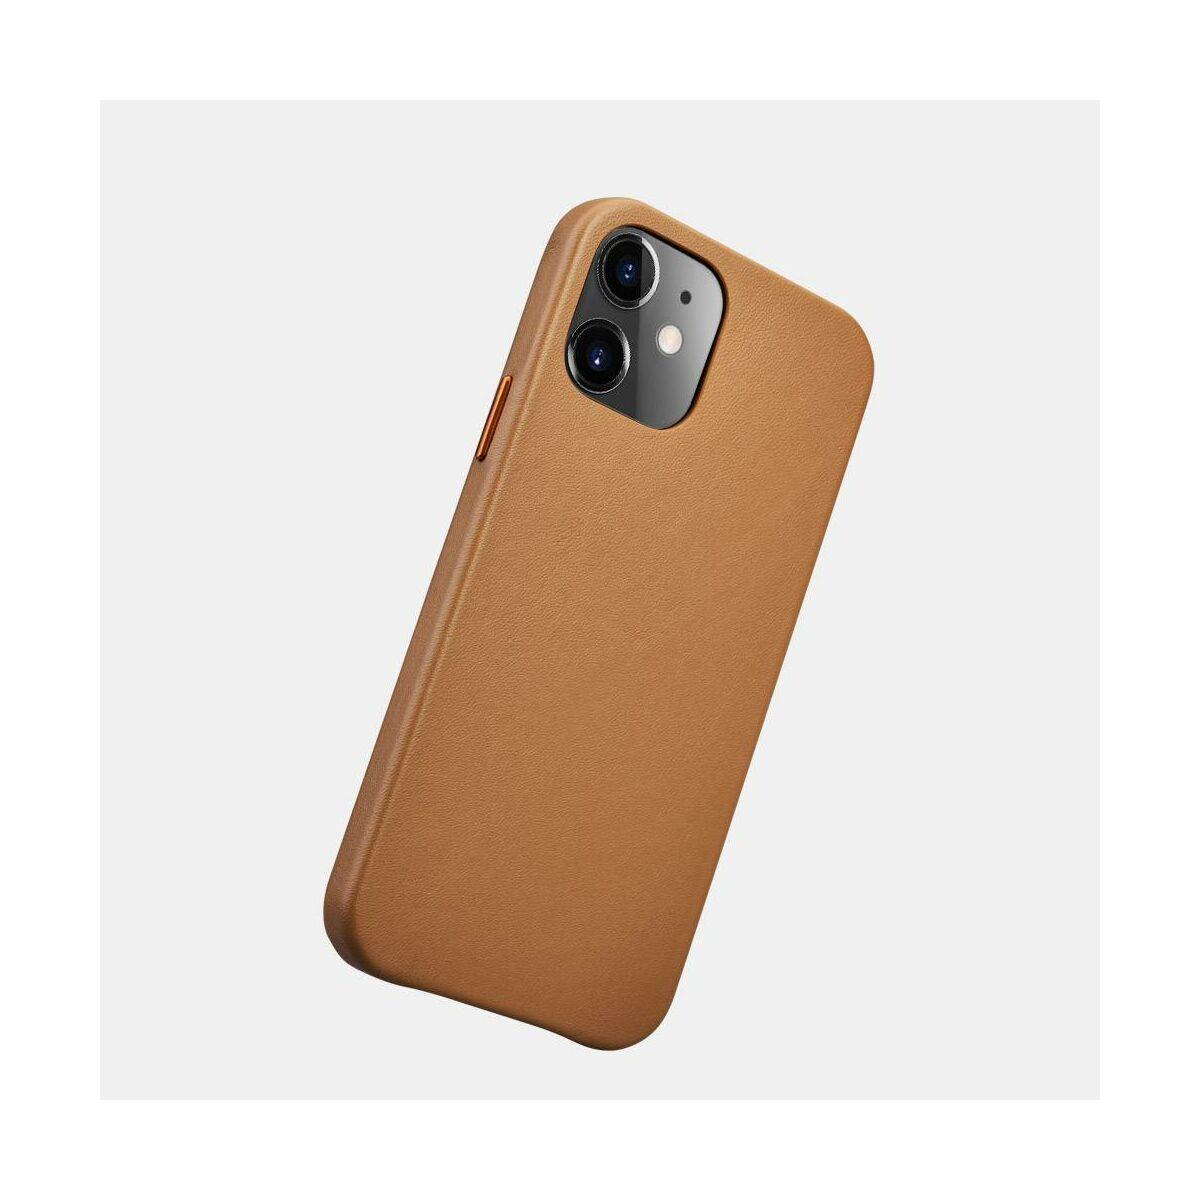 iCarer iPhone 12 /12 Pro (6.1) tok, Eredeti valódi bőr, barna